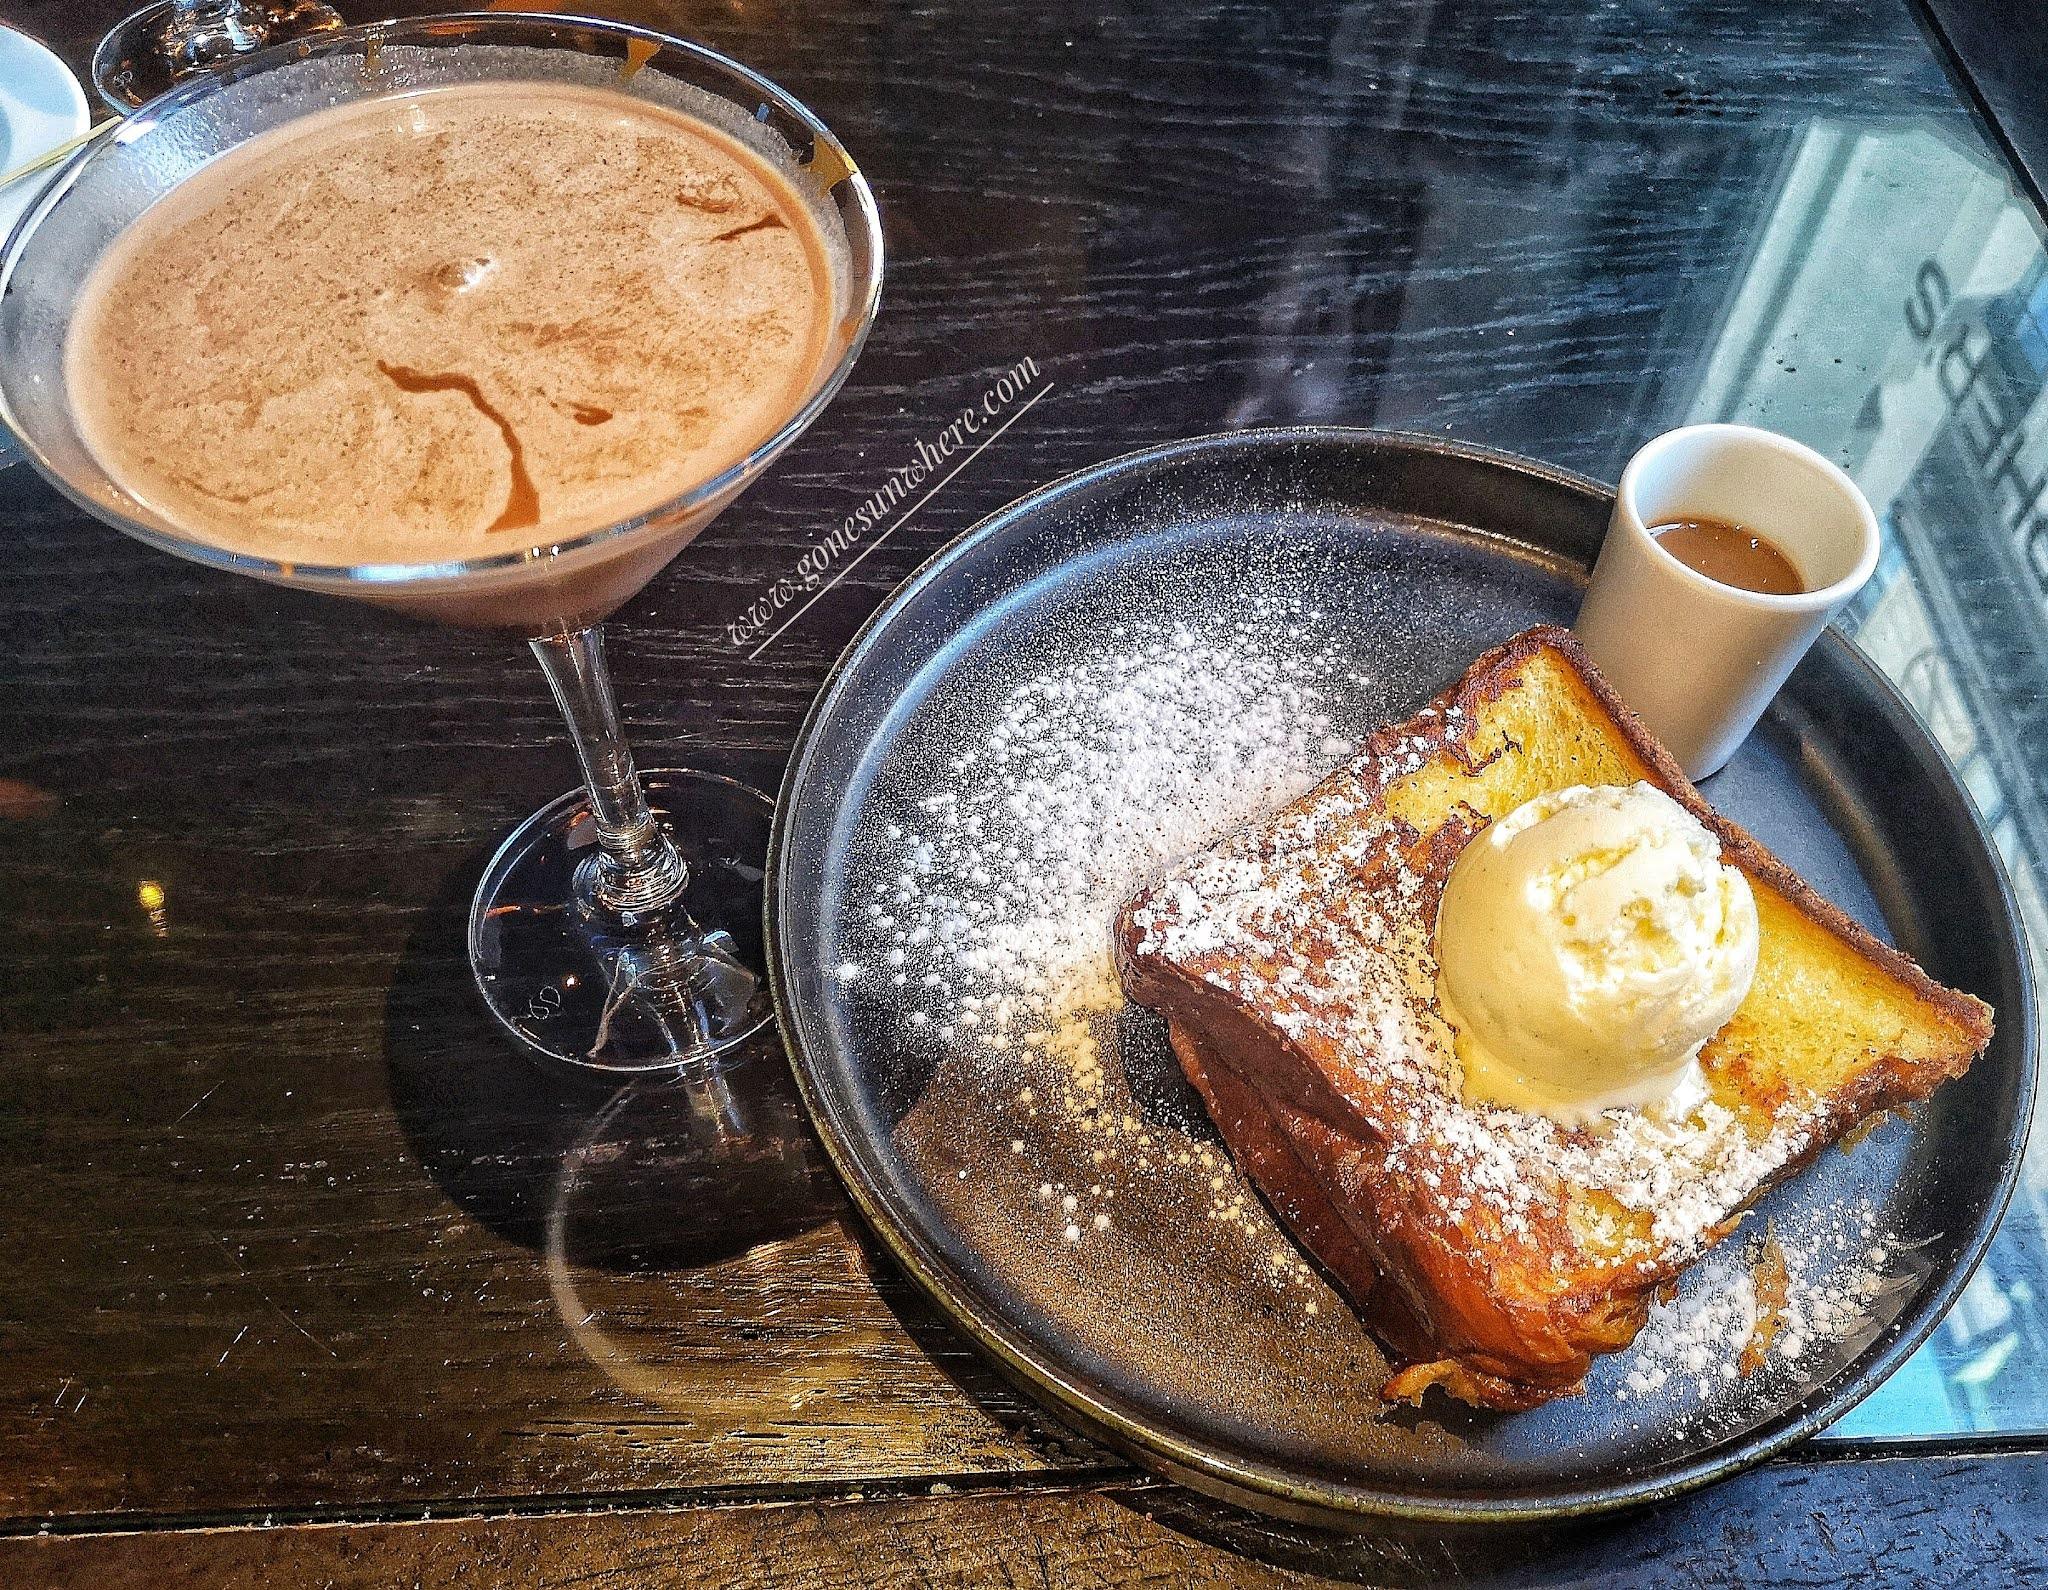 Martini drink and dessert